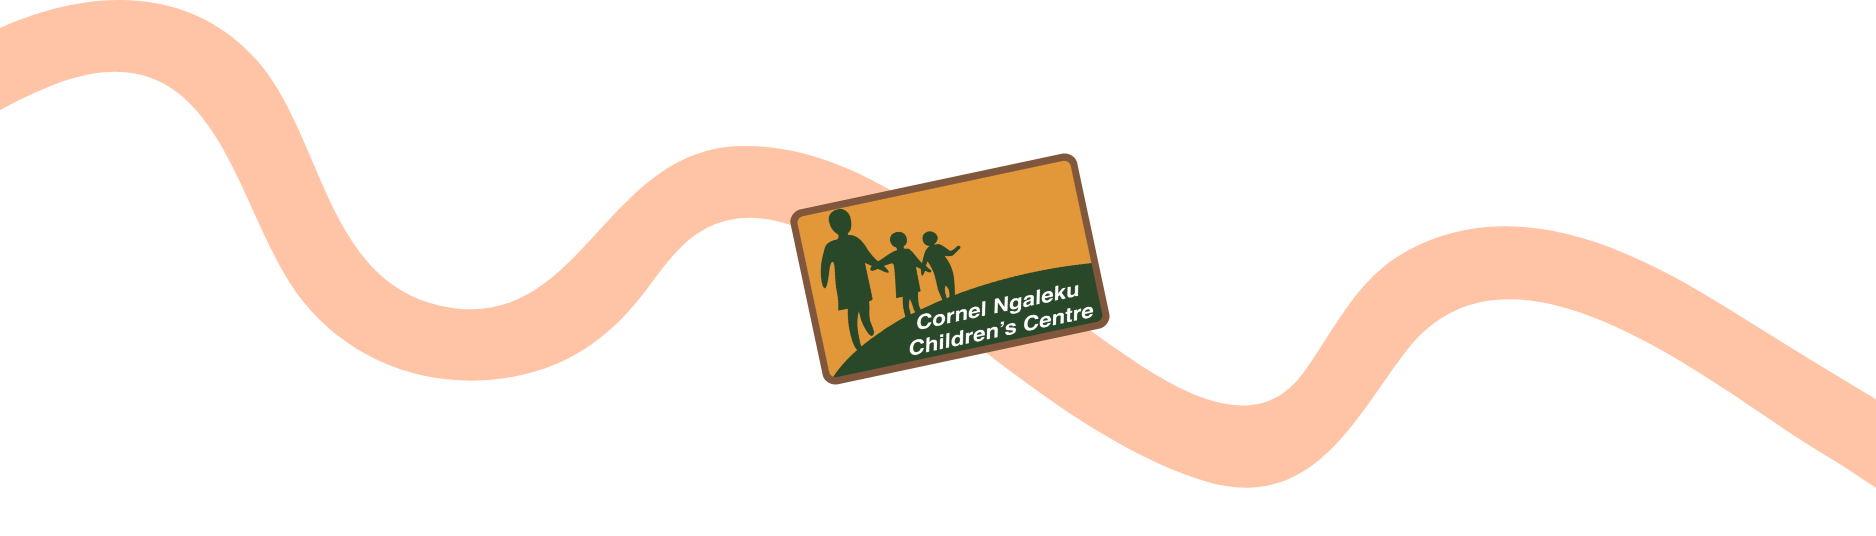 Scheidingslijn en logo CNCC